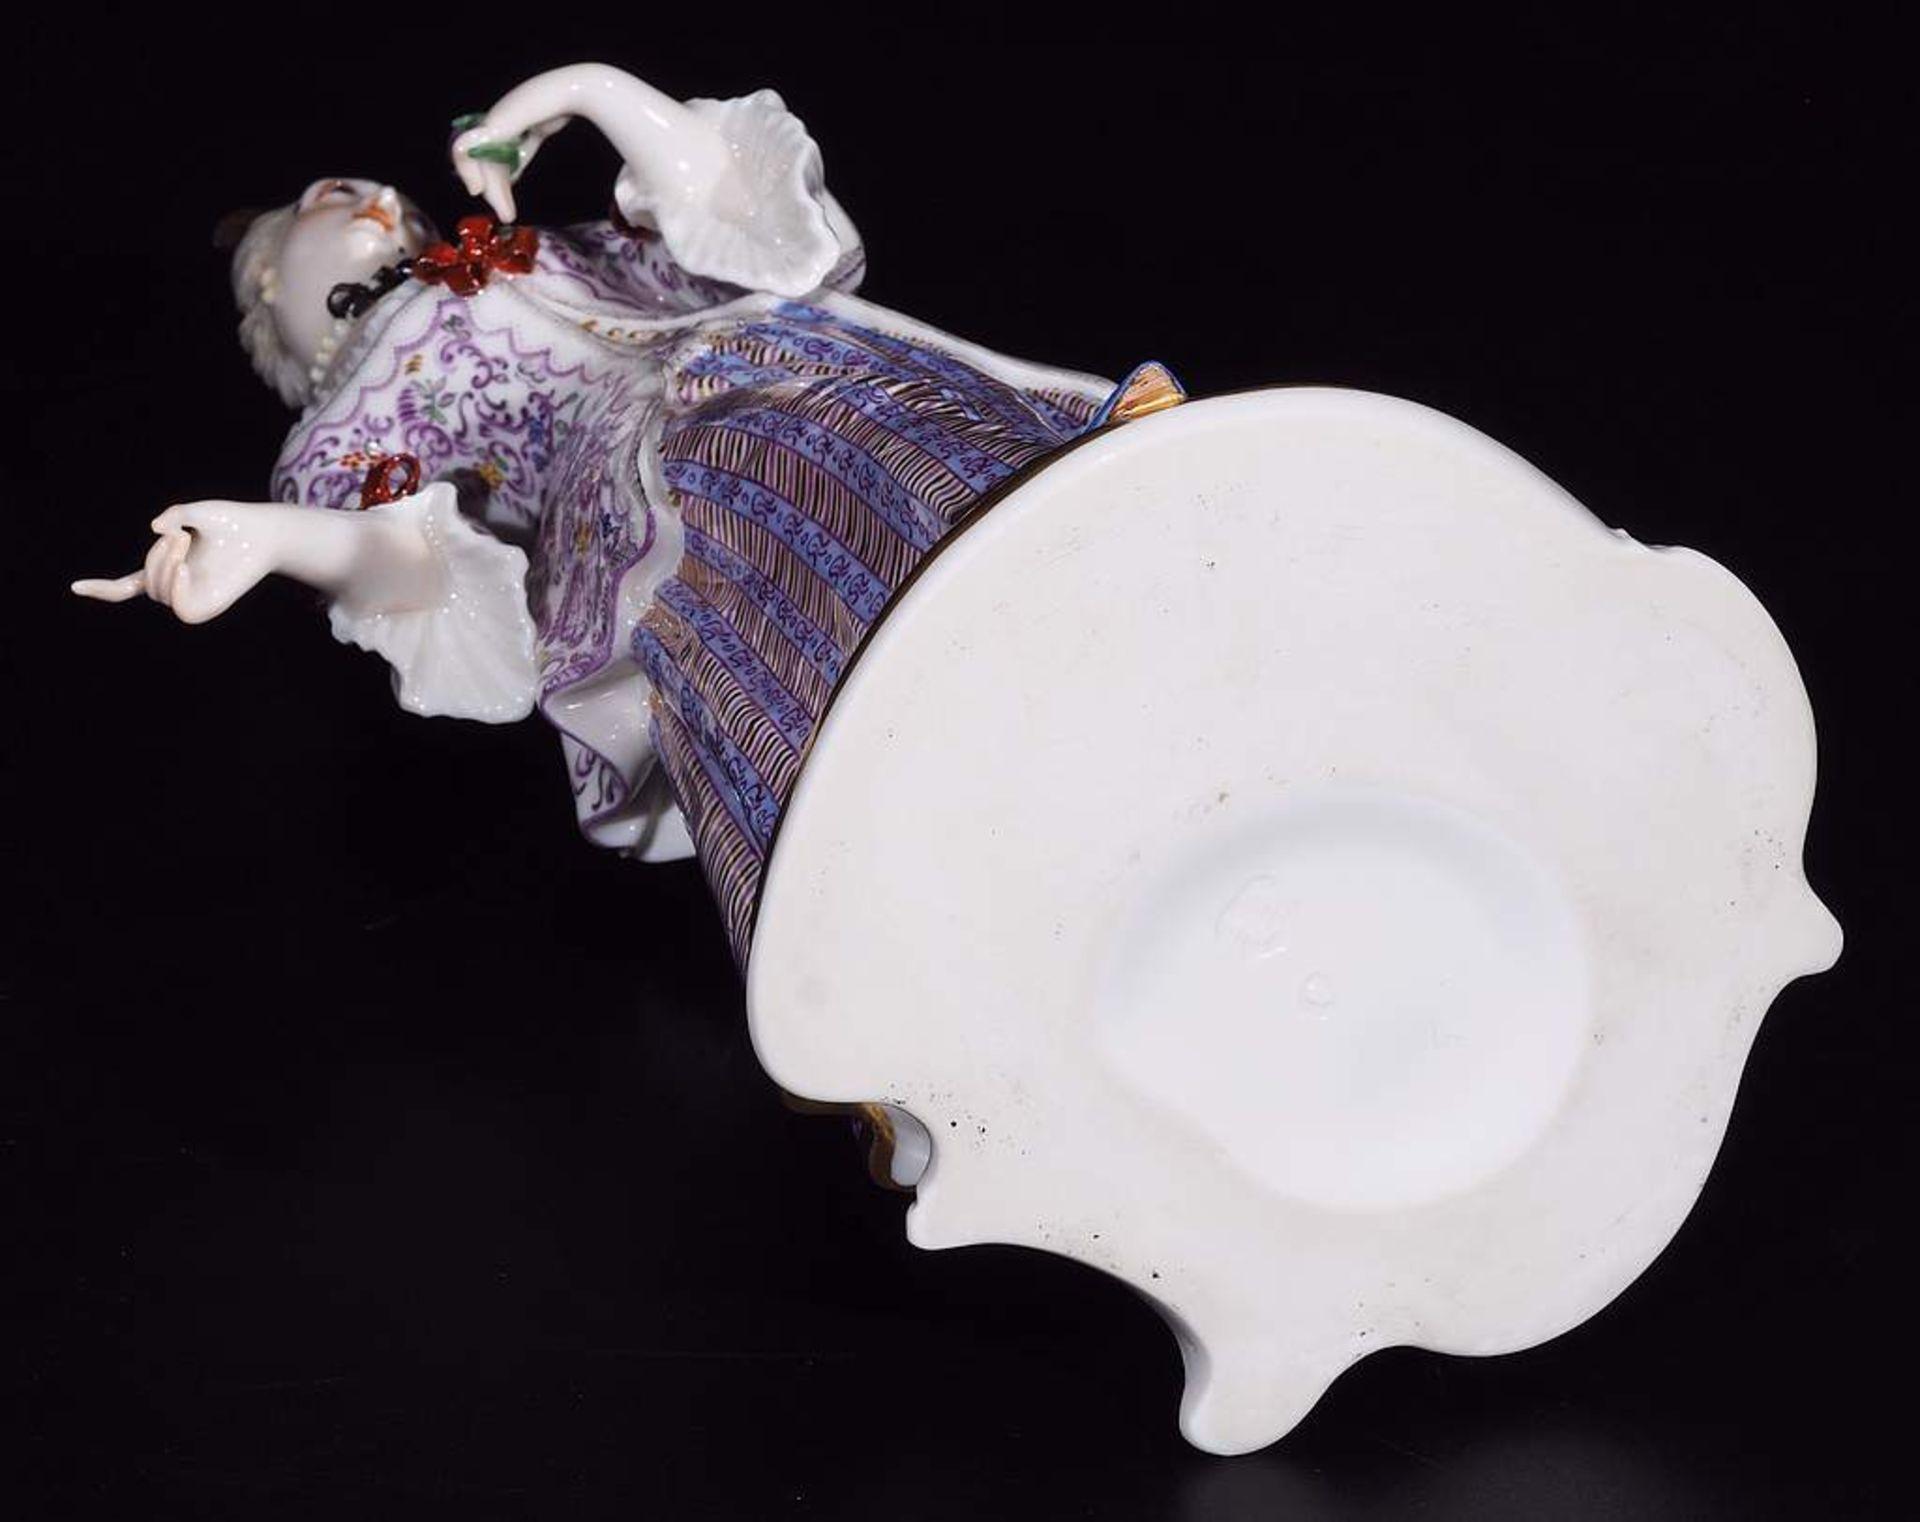 LUCINDA, Figurine der Commedia dell'Arte, NYMPHENBURG, Jahrhundert. - Image 7 of 8